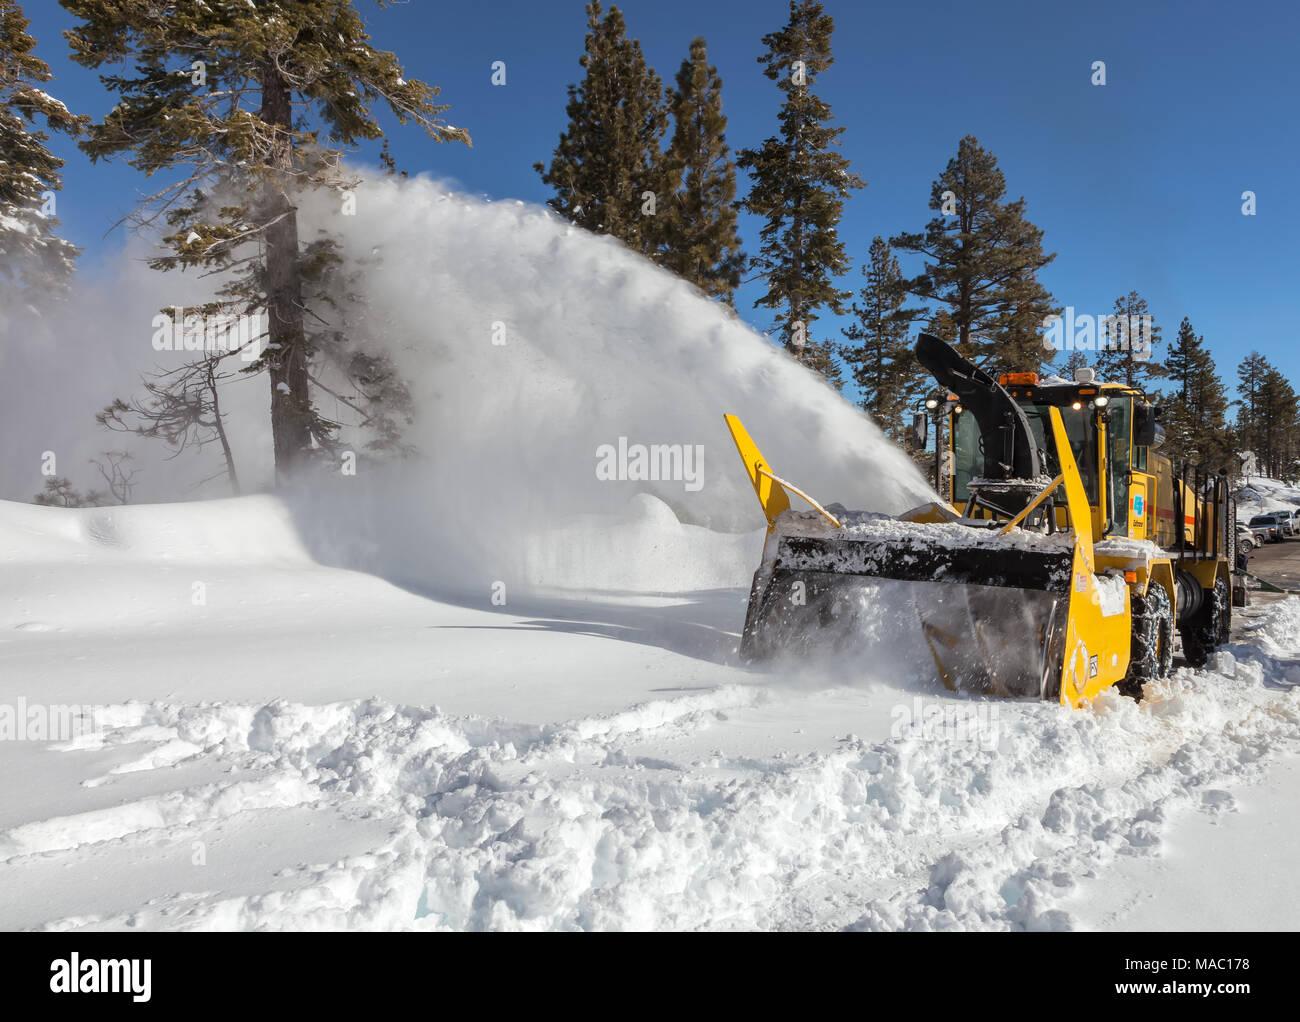 Western neve aratro hook up